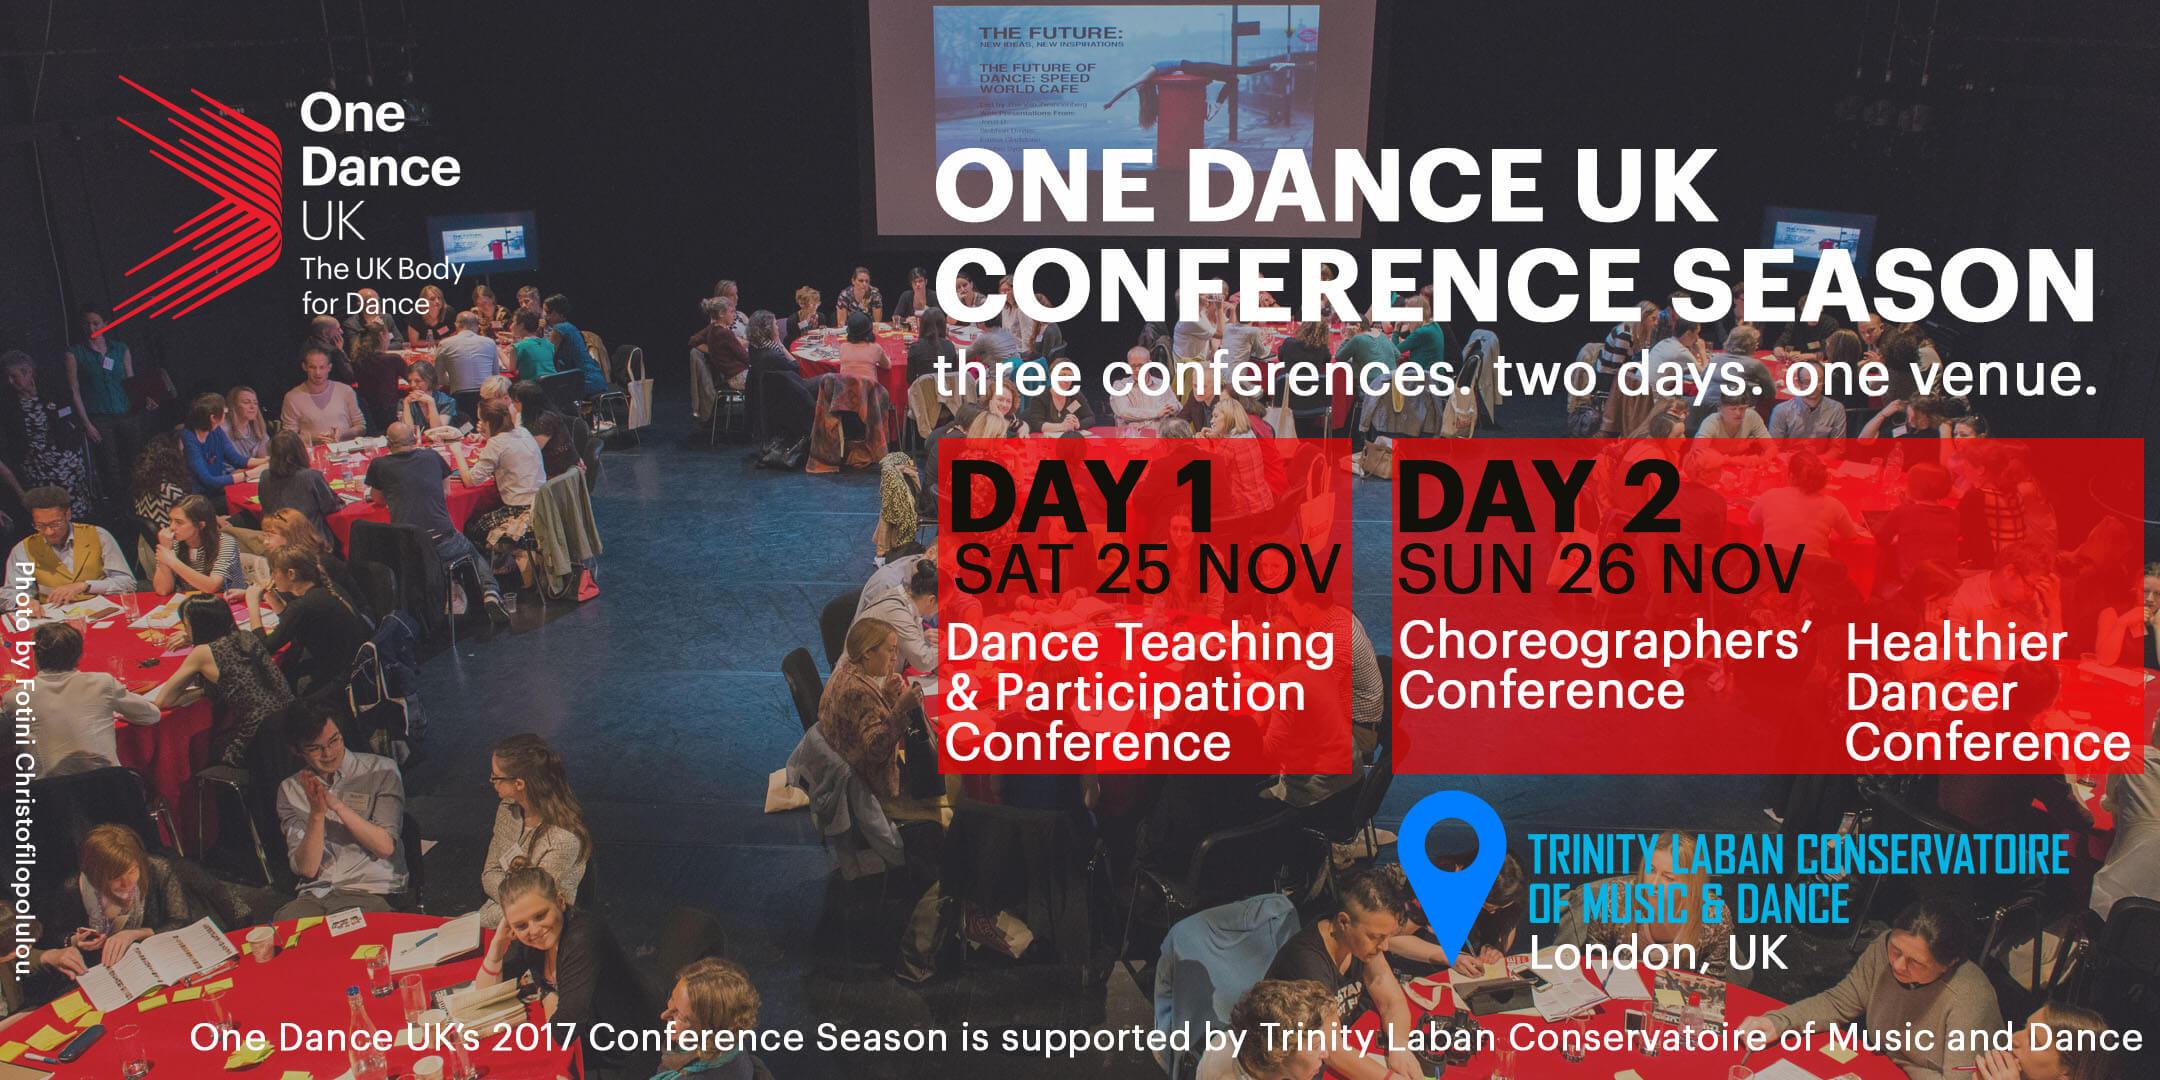 ONE DANCE UK CONFERENCE SEASON